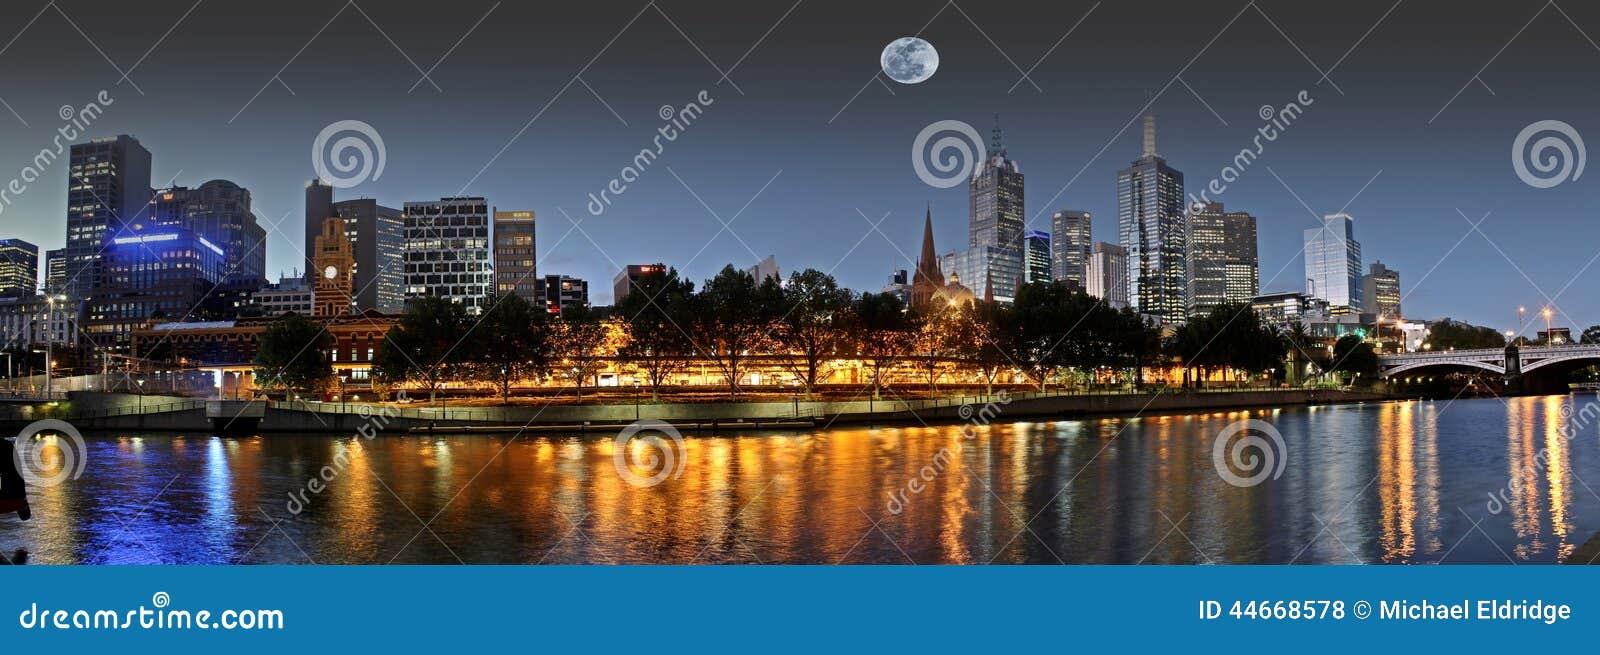 Pleine lune au-dessus de Melbourne